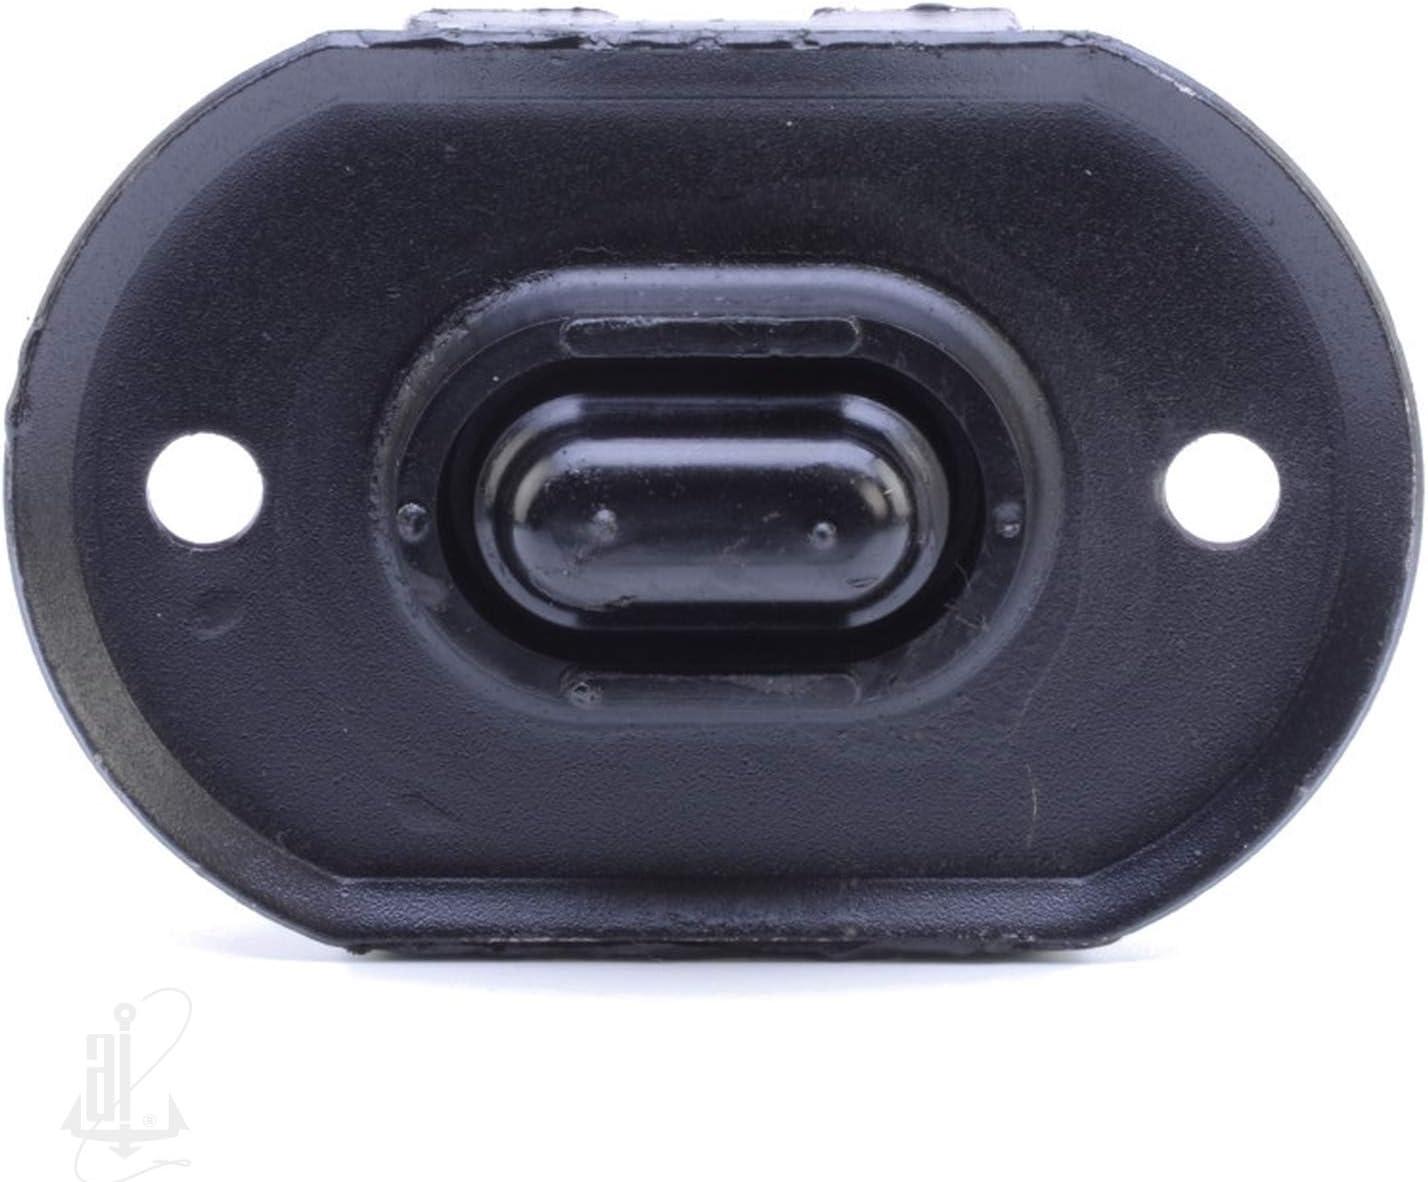 IAP Performance 311301265C Front Transmission Mount for VW Beetle